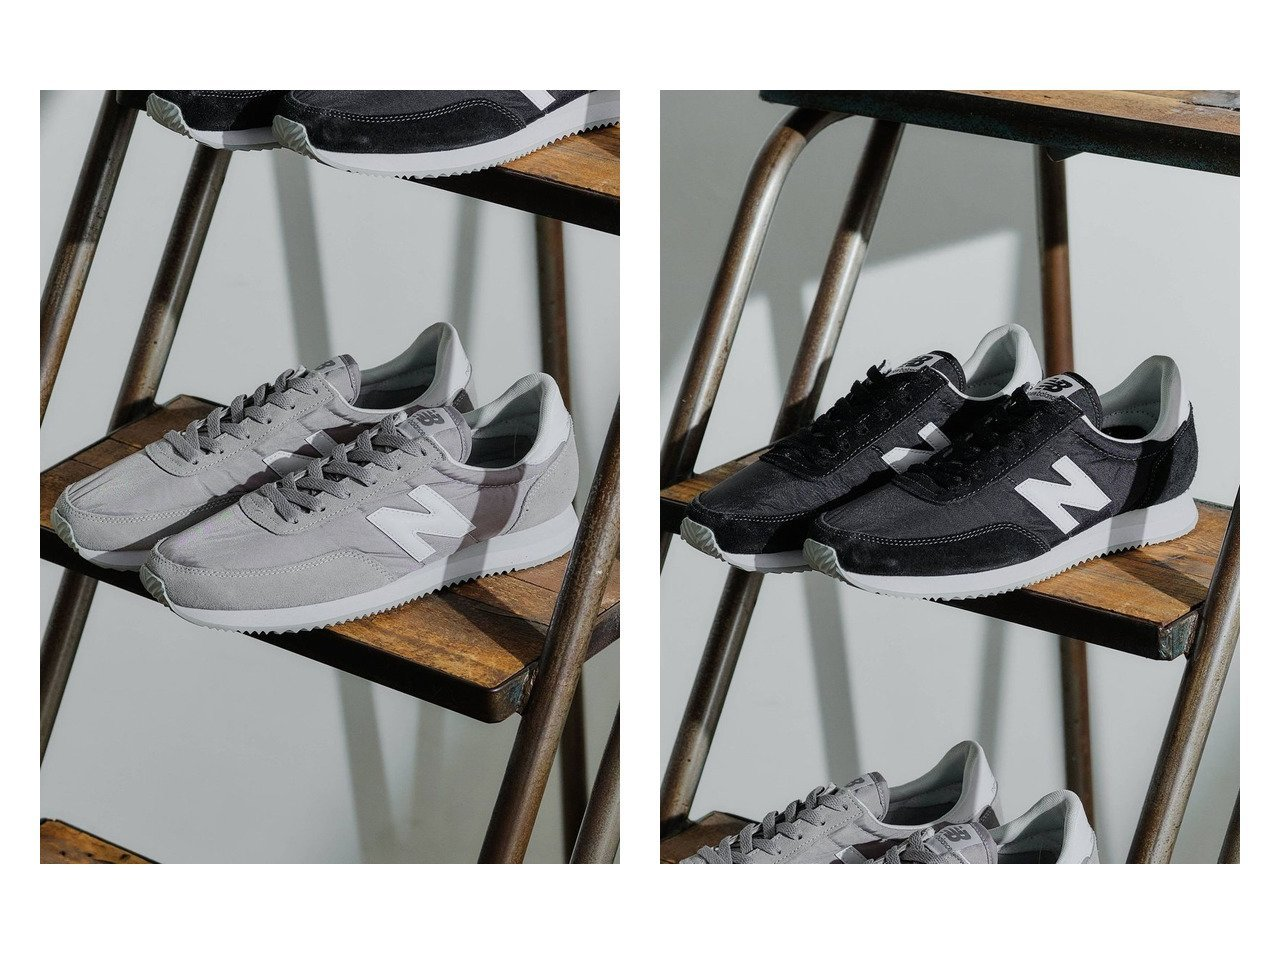 【green label relaxing / UNITED ARROWS/グリーンレーベル リラクシング / ユナイテッドアローズ】のニューバランス New Balance SC UL720 V2 スニーカー 【シューズ・靴】おすすめ!人気、トレンド・レディースファッションの通販 おすすめで人気の流行・トレンド、ファッションの通販商品 インテリア・家具・メンズファッション・キッズファッション・レディースファッション・服の通販 founy(ファニー) https://founy.com/ ファッション Fashion レディースファッション WOMEN コンビ シューズ スタイリッシュ スニーカー スリッポン スリム バランス フィット フォルム ベーシック ランニング |ID:crp329100000052826